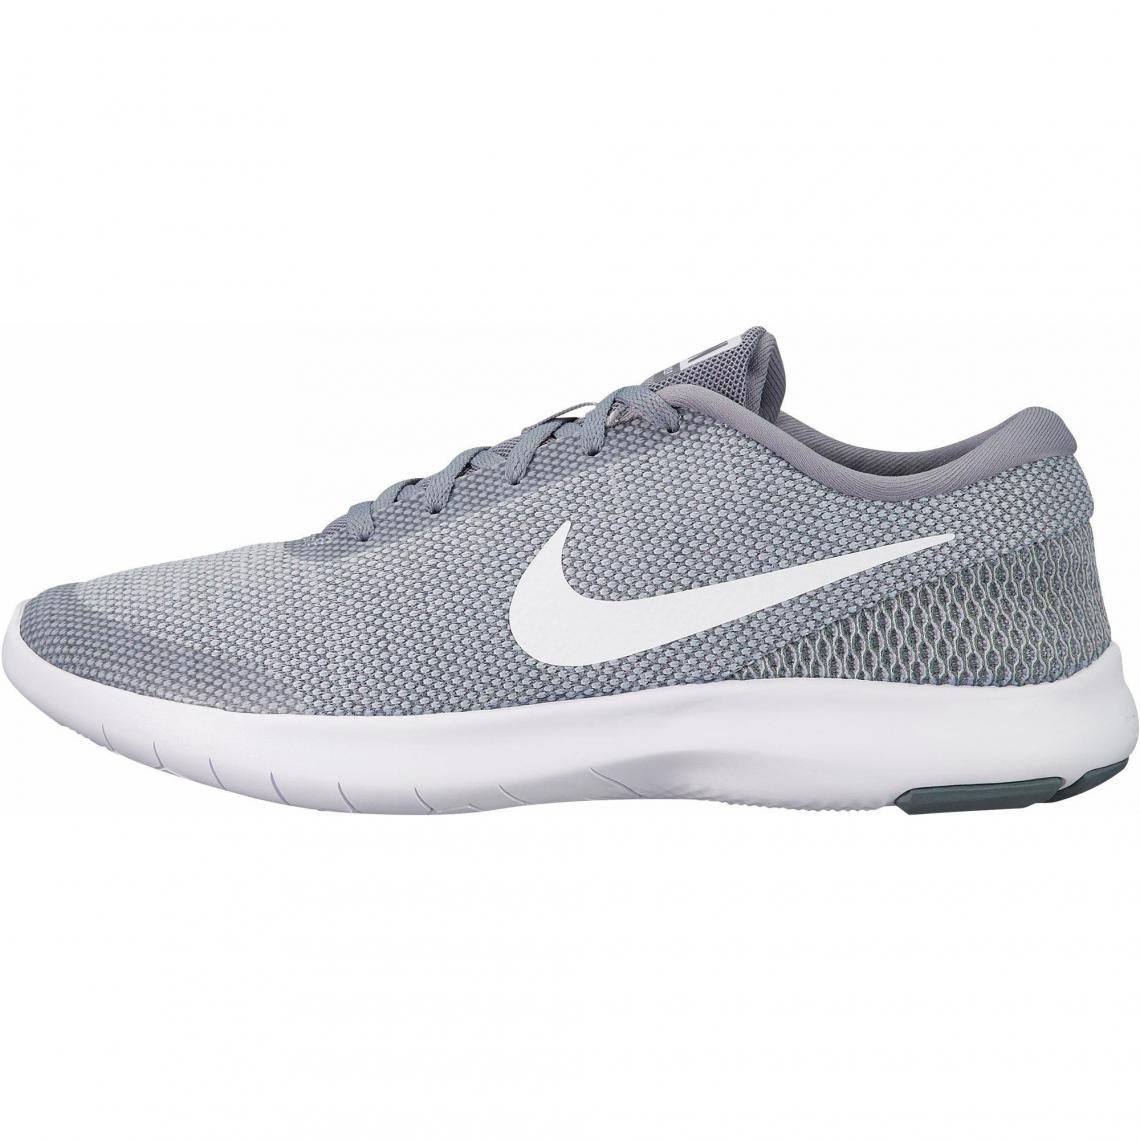 1122b1153274 Baskets femme Wmns Flex Experience Run 7 Nike - Gris - Blanc Nike Femme